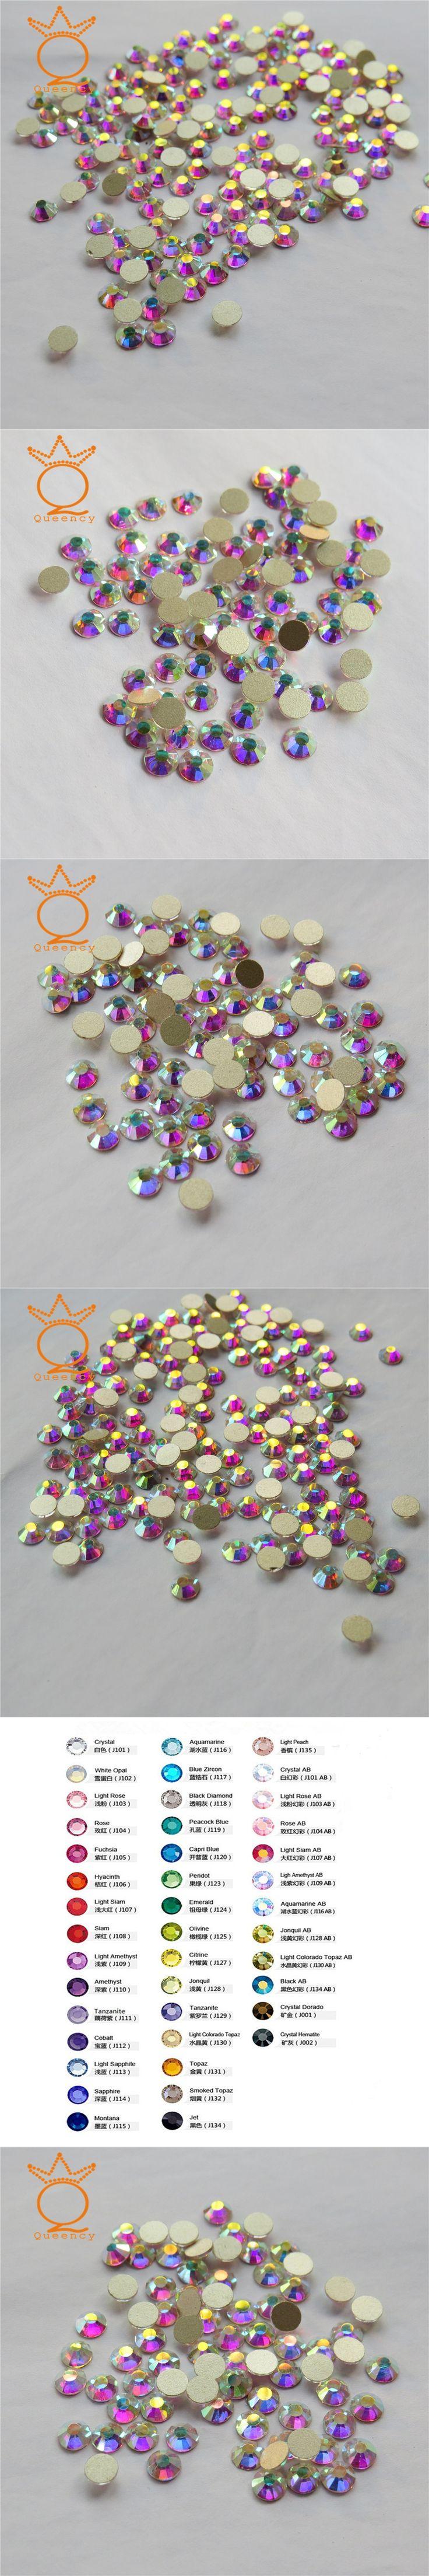 Queency SS20 1440pcs Packing AB Non Hotfix Flatback Rhinestones Nail Rhinestones for Nails Art Decoration Gems